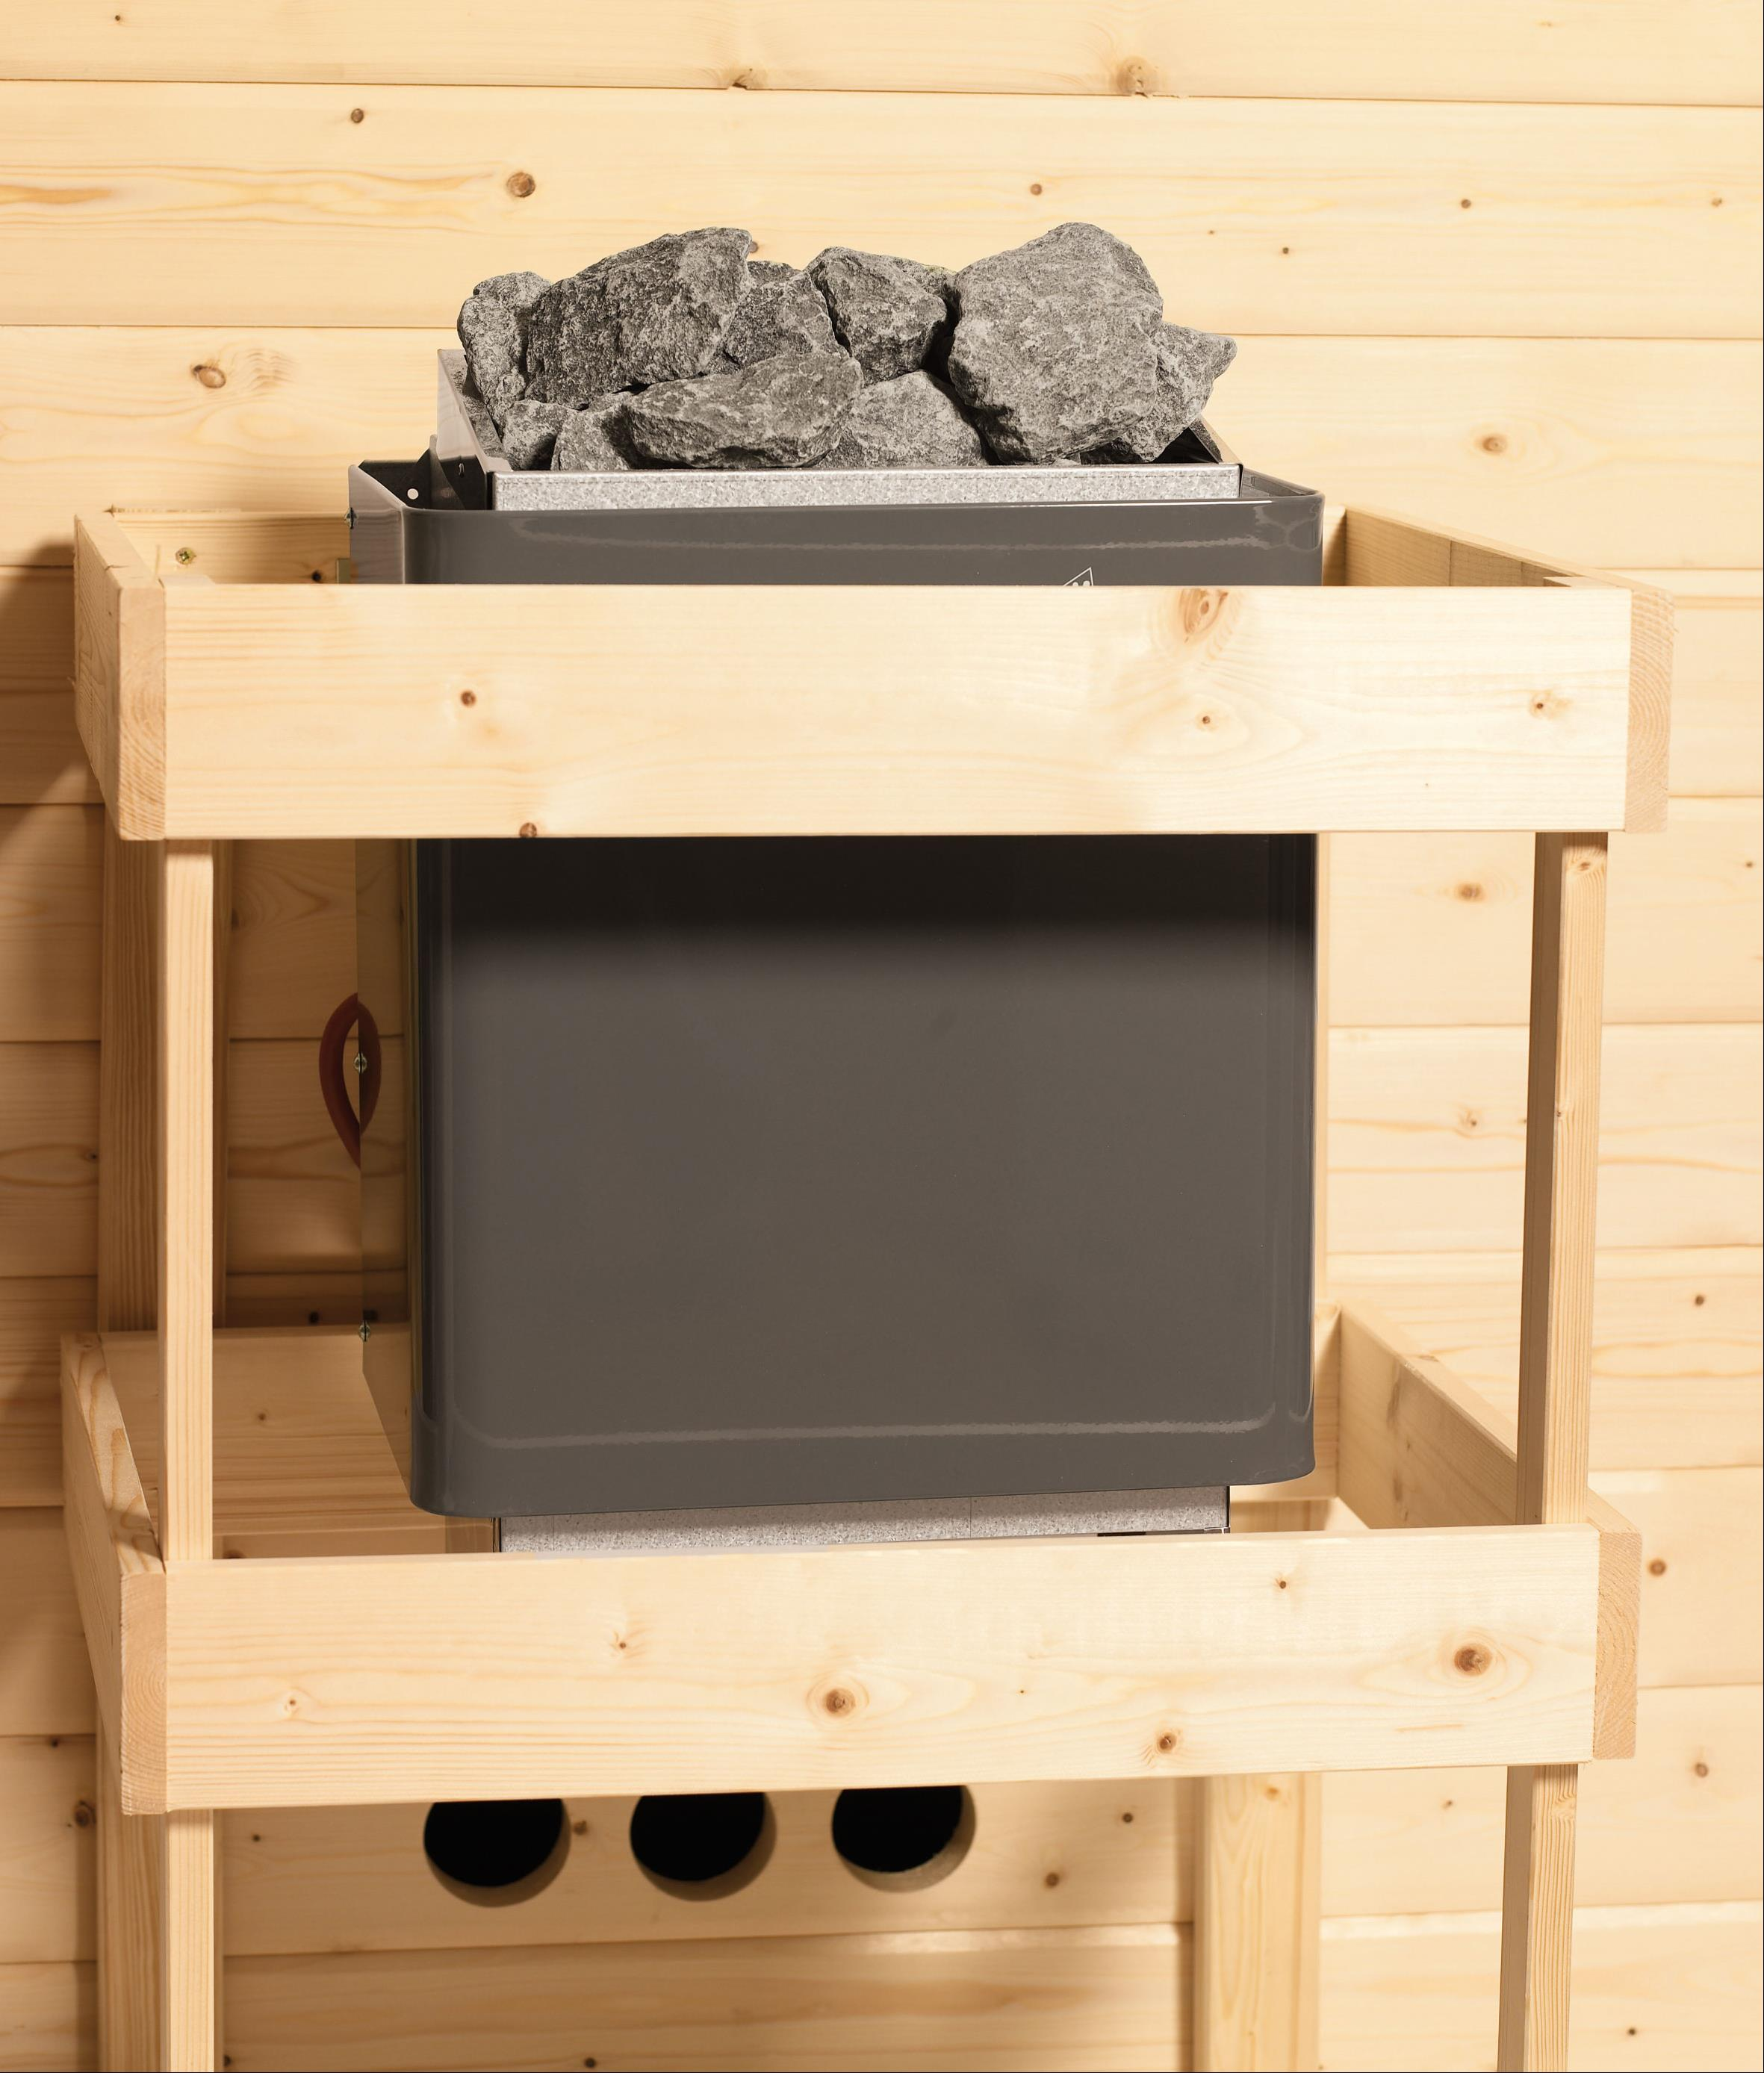 Woodfeeling Sauna Leona 38mm Ofen 9kW extern Tür Holz Bild 9